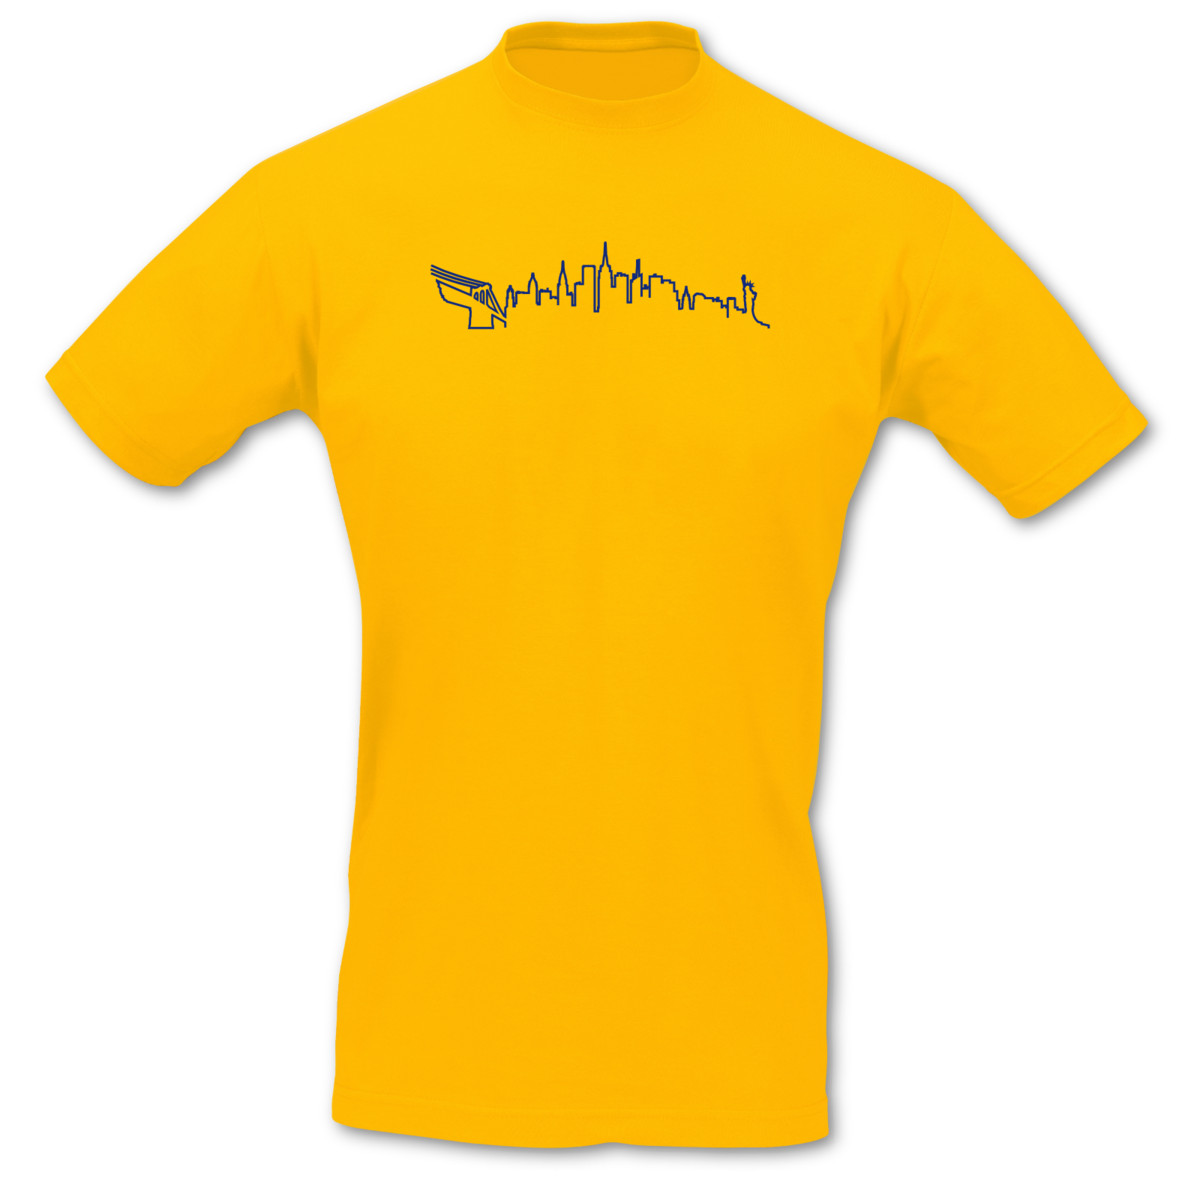 New-York-Silhouette-Skyline-T-Shirt-City-8-Farben-S-5XL